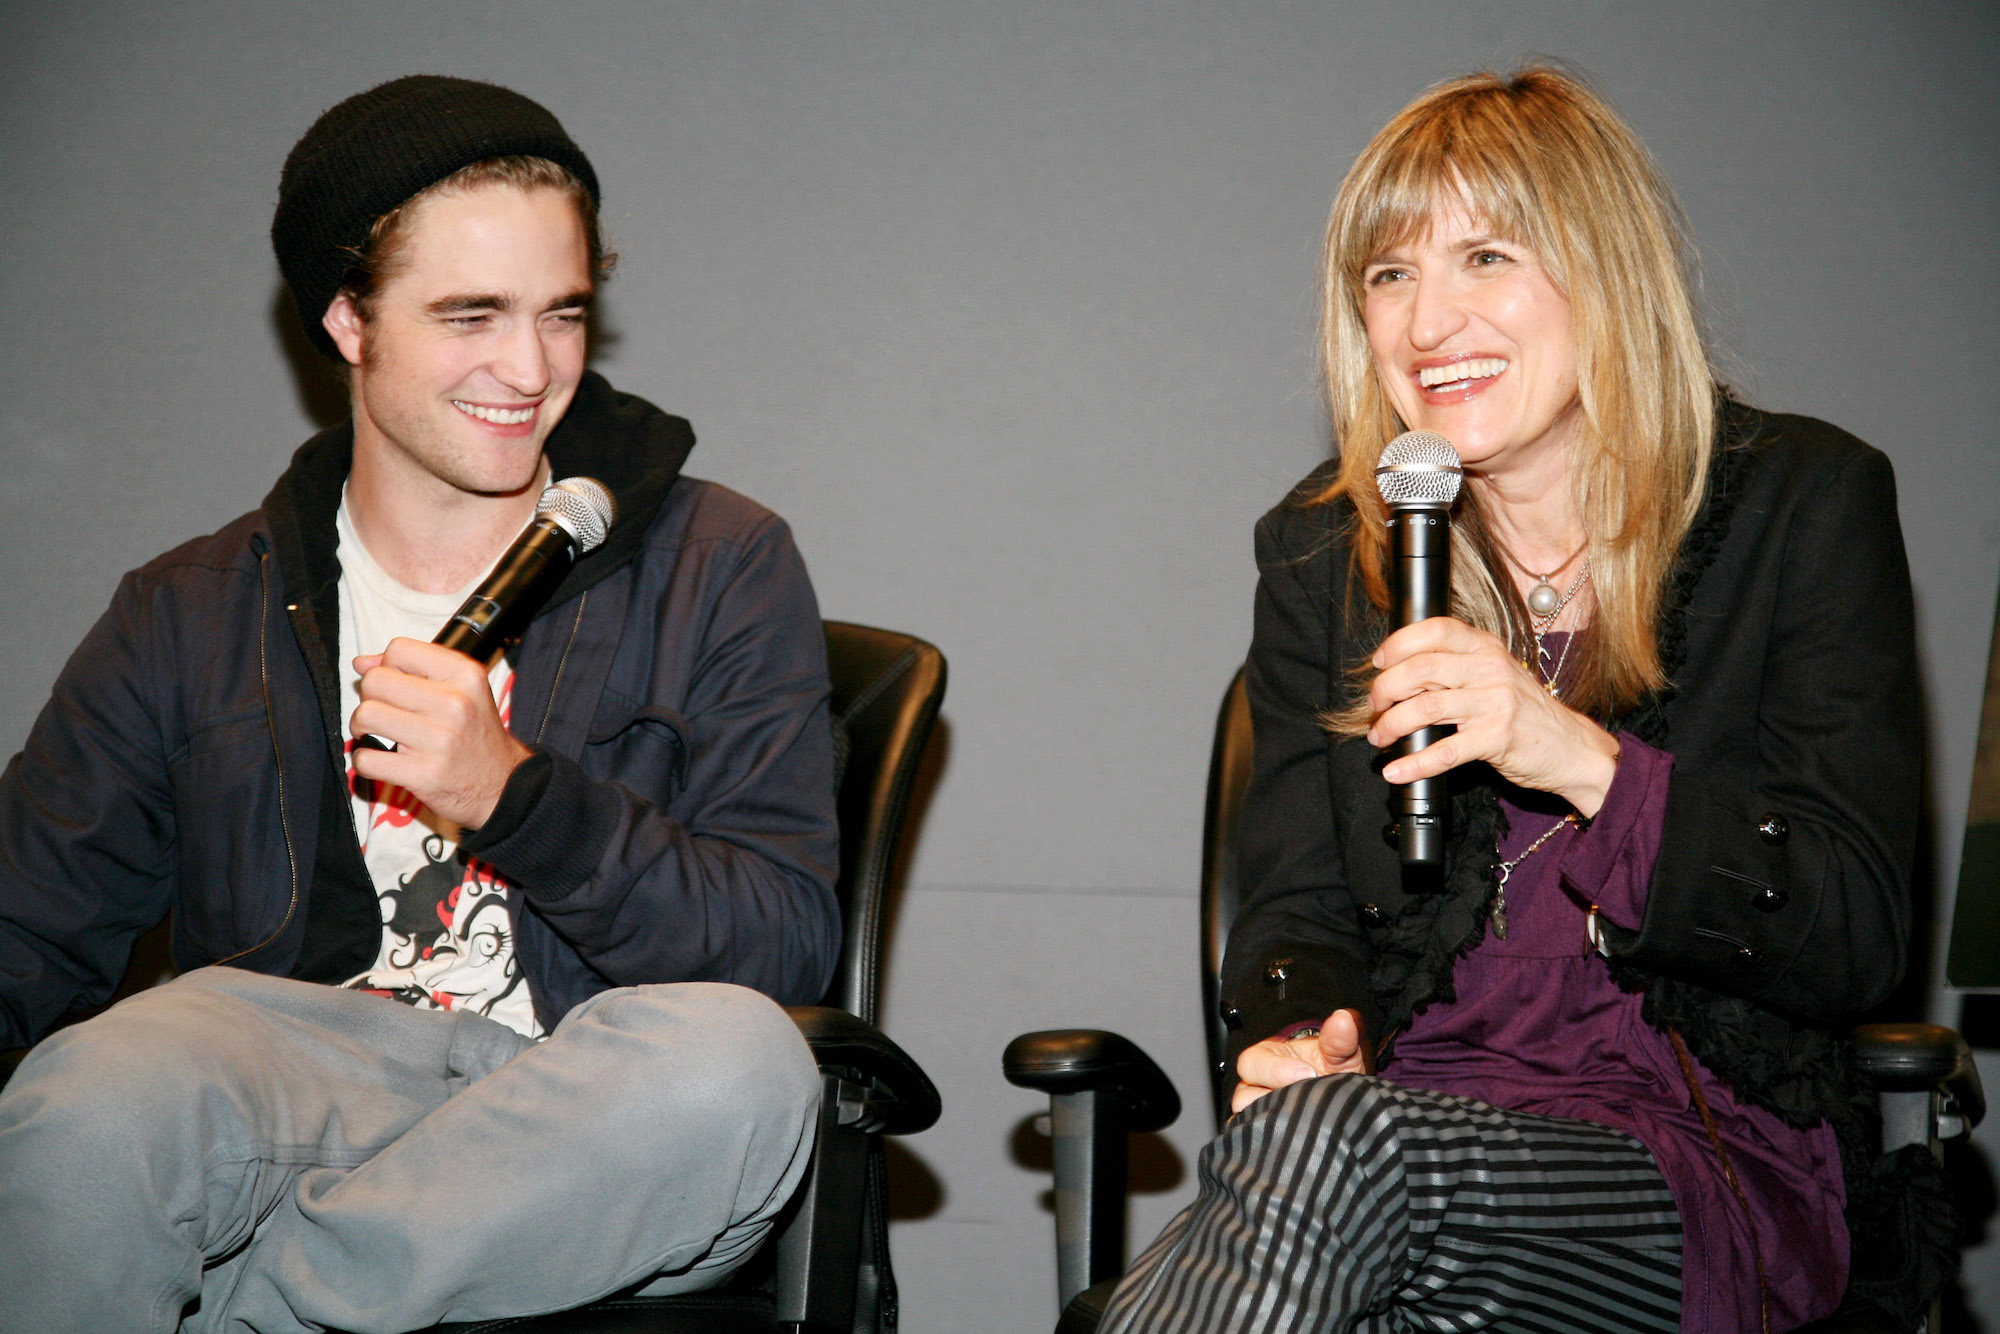 Robert Pattinson and Catherine Hardwicke promote 'Twilight' at the Apple Store on Nov. 3, 2008.